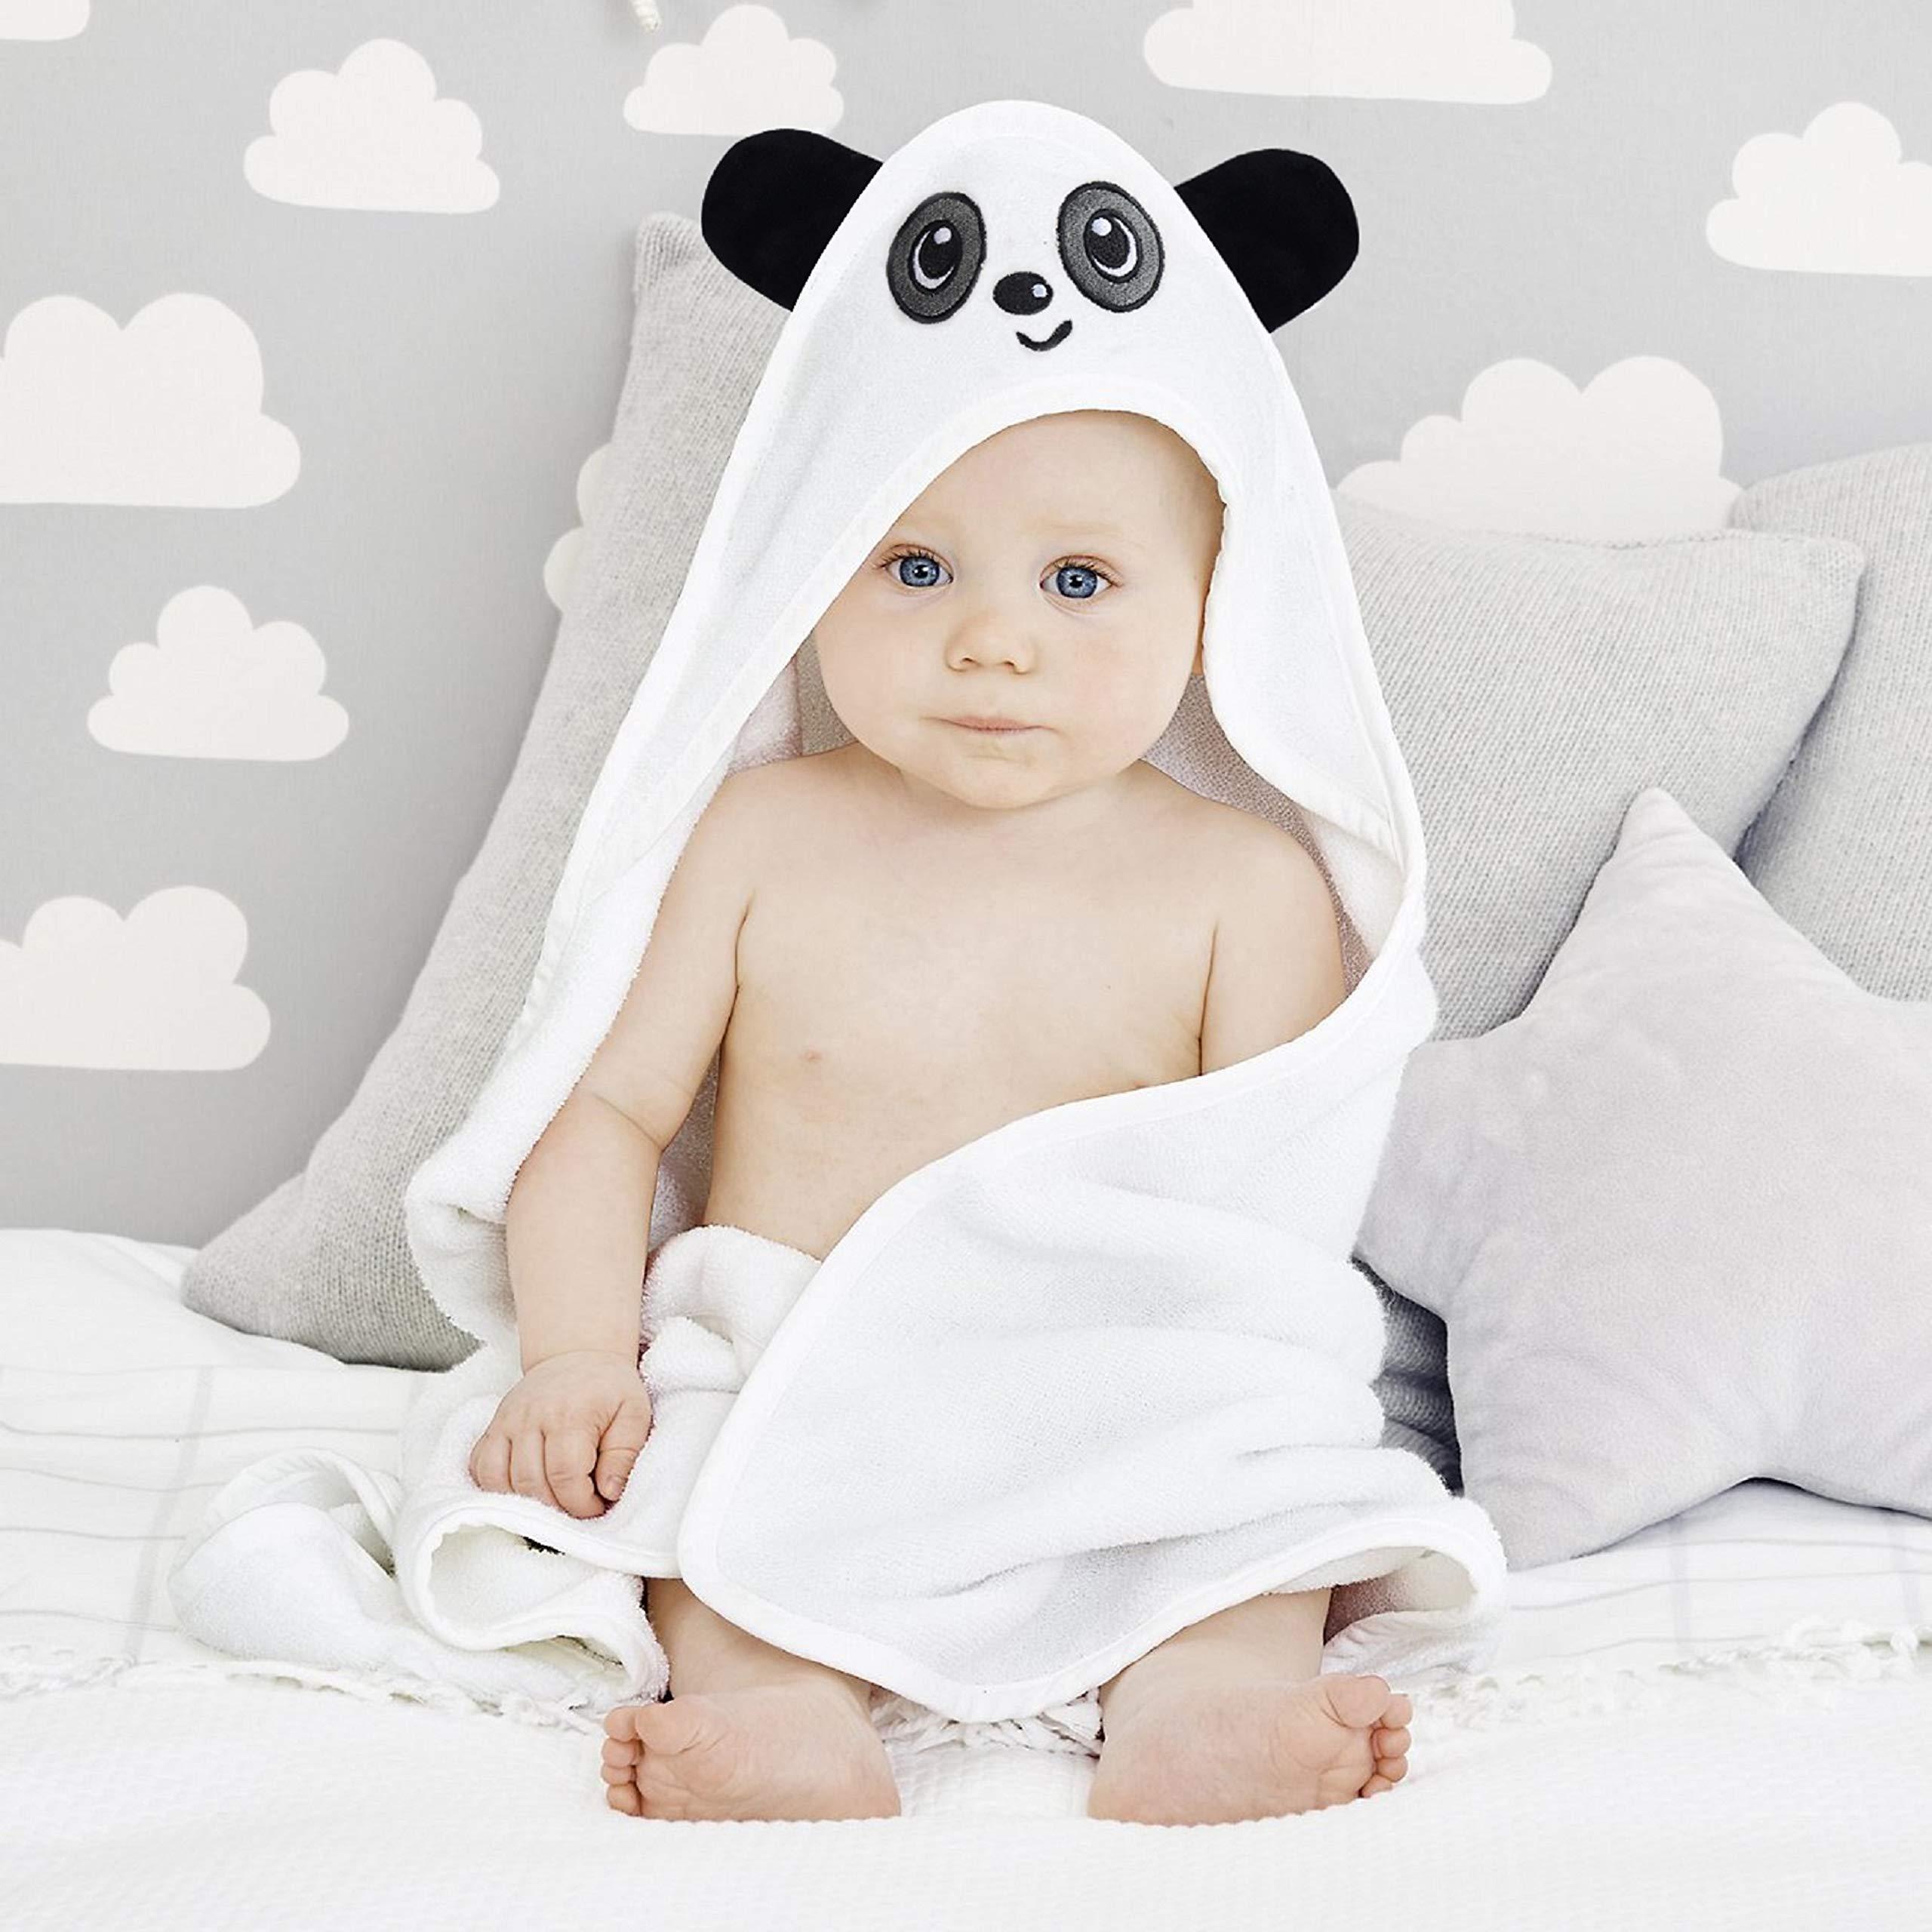 Baby Hooded Premium Quality Organic Bamboo Bath Towel (35'' x 35'', White) by VALIANT